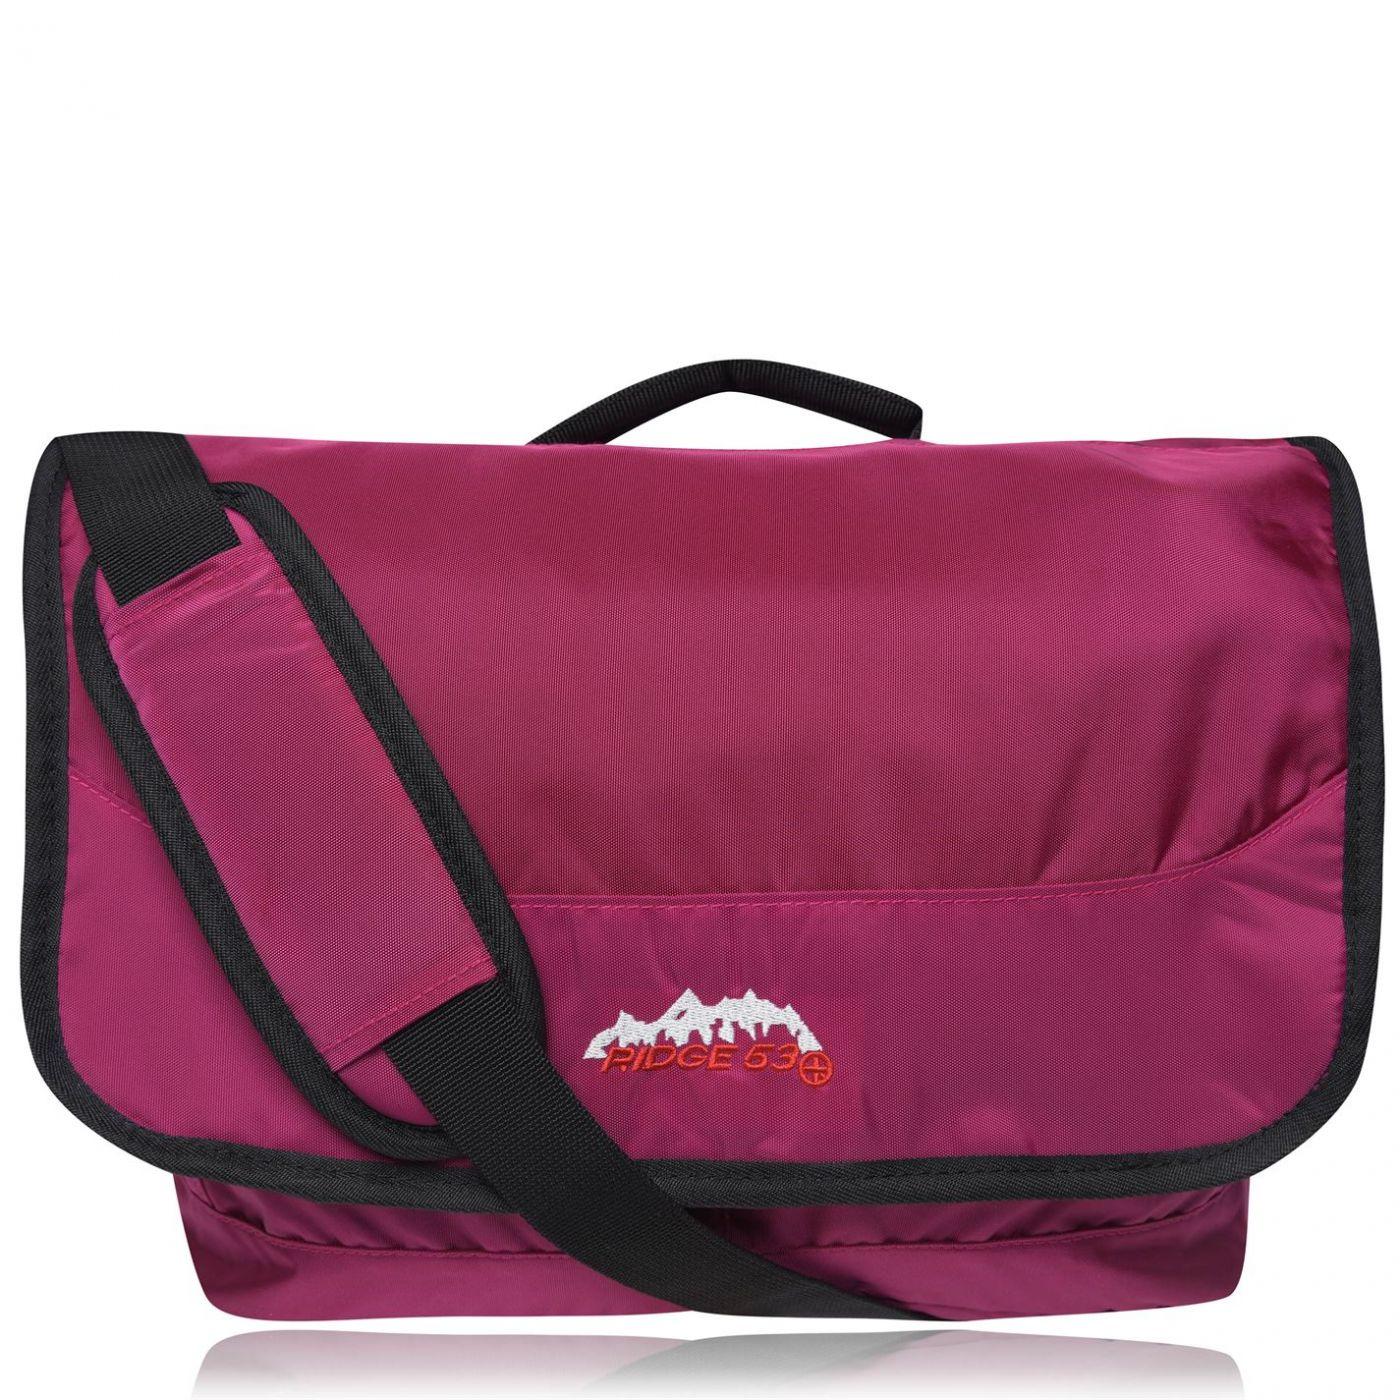 Ridge 53 53 Satchel Bag